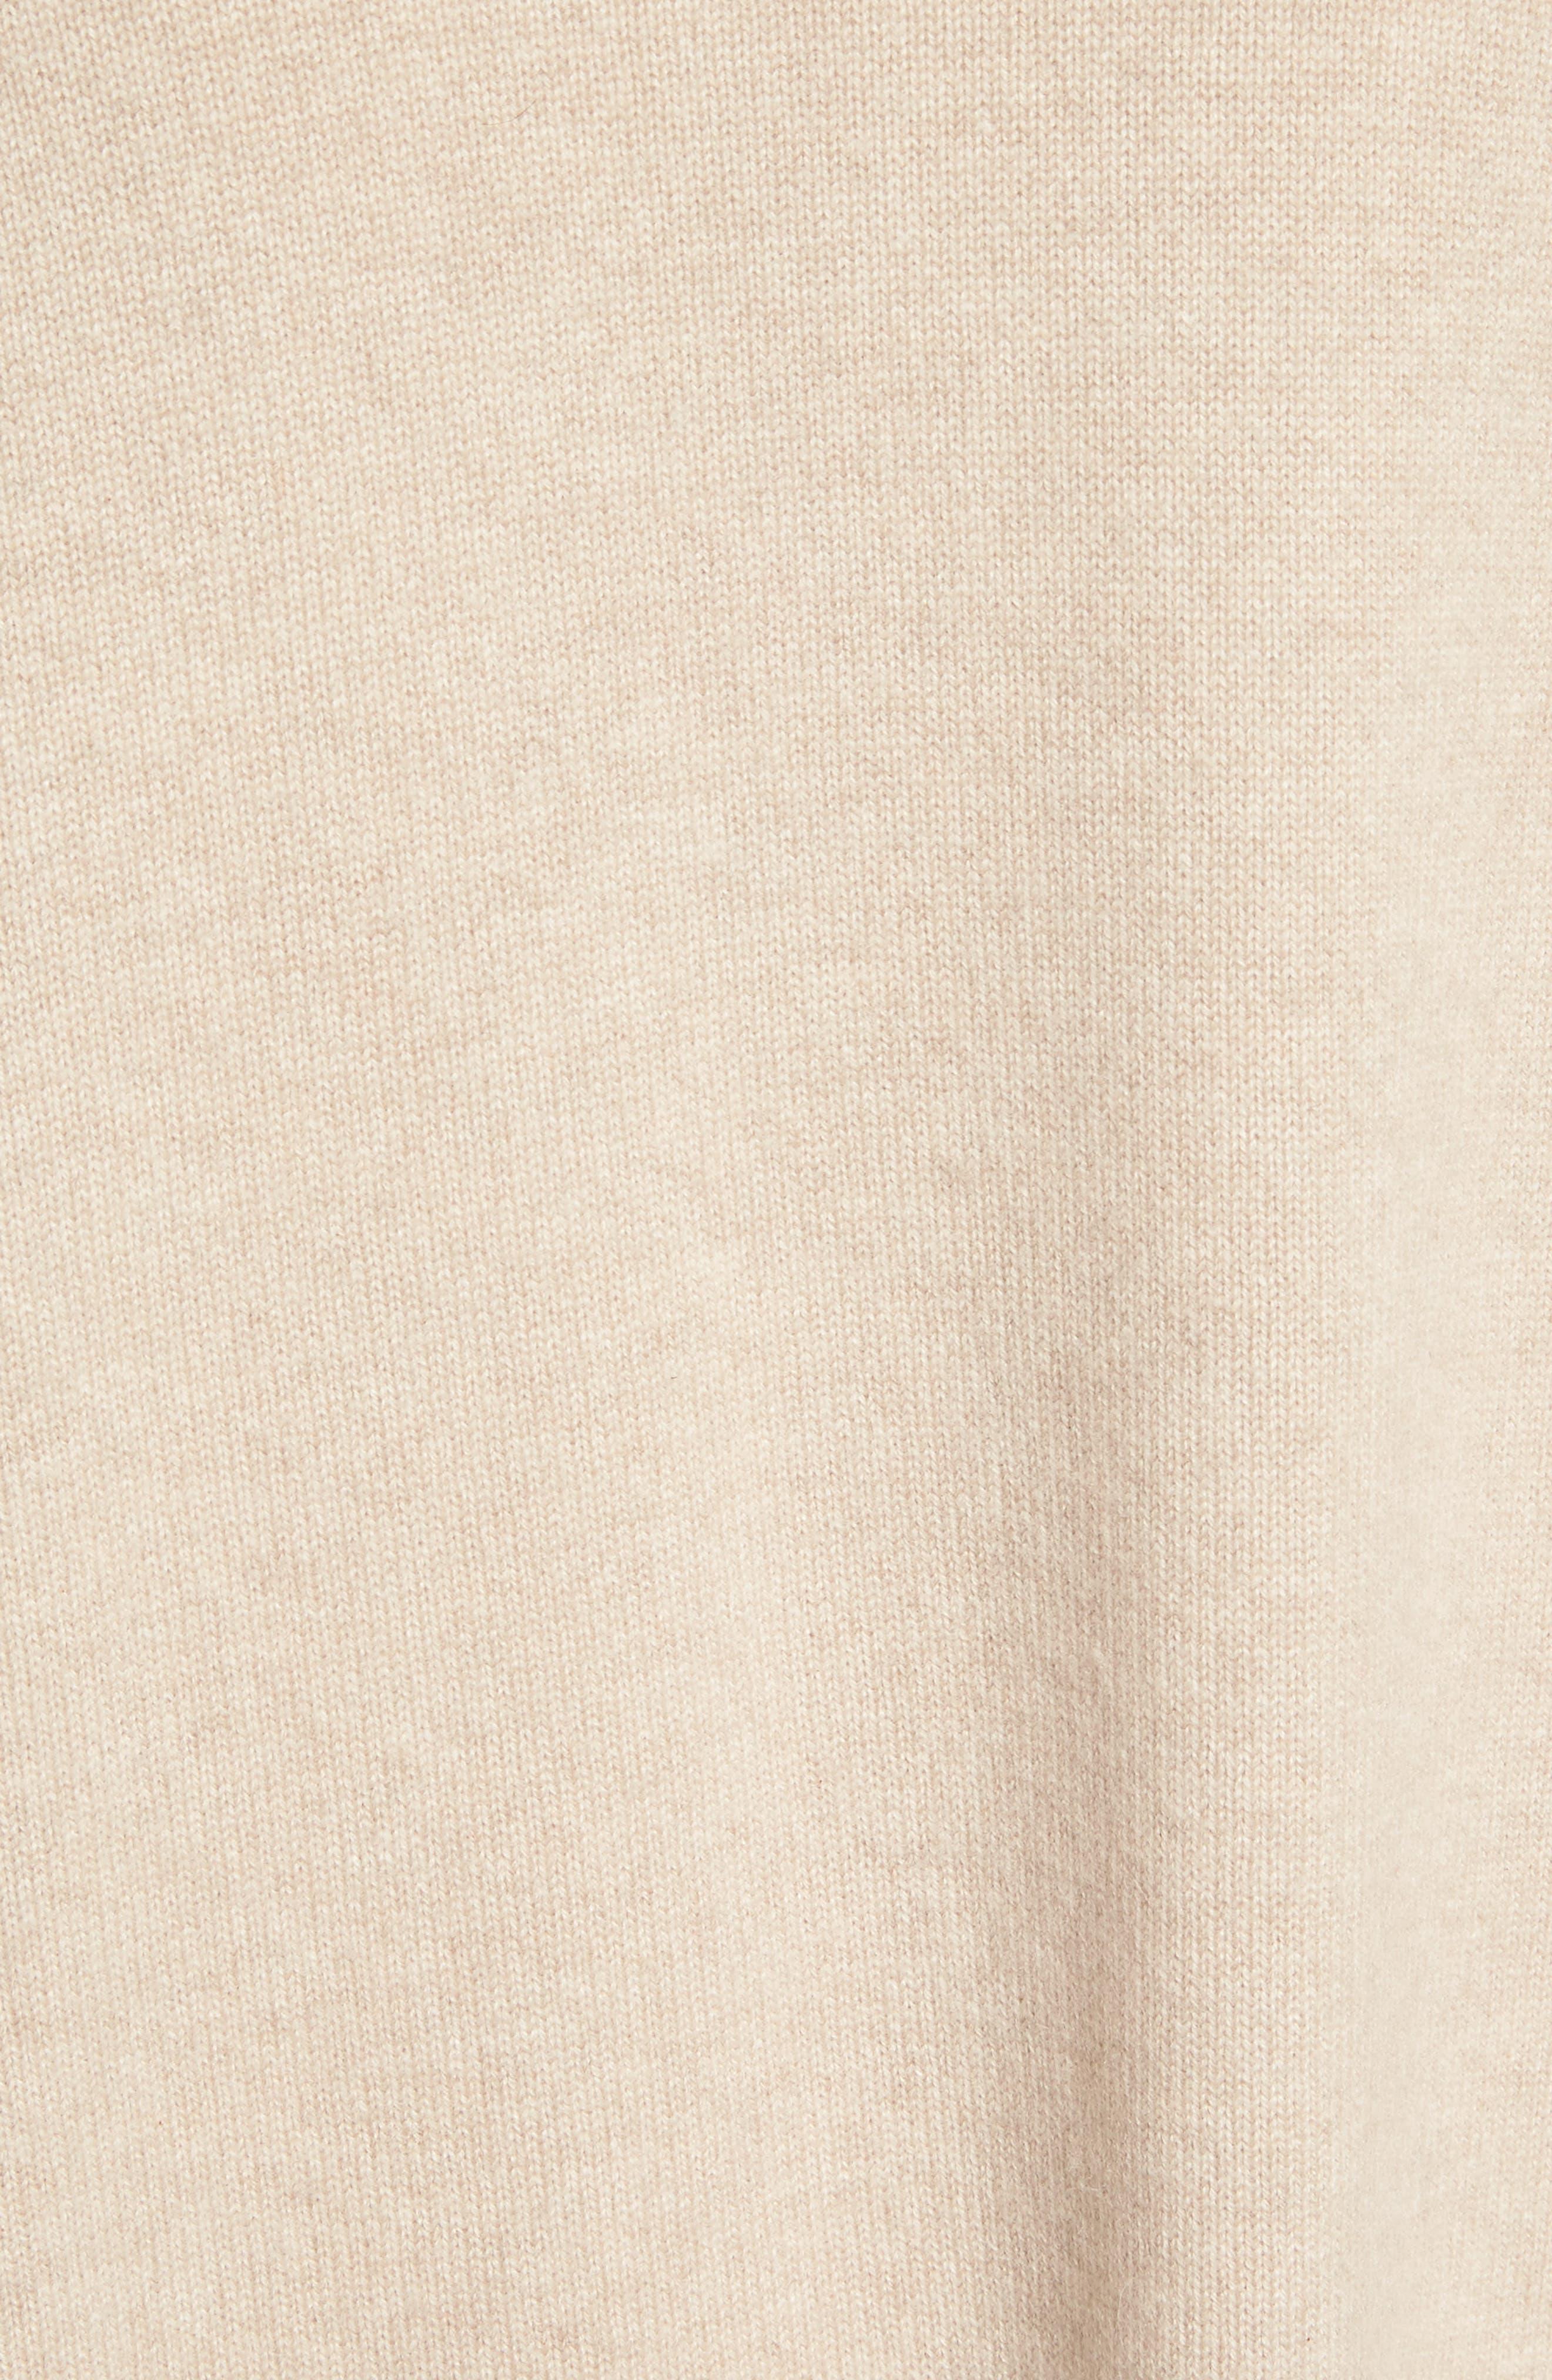 Long Cashmere Cardigan,                             Alternate thumbnail 5, color,                             233